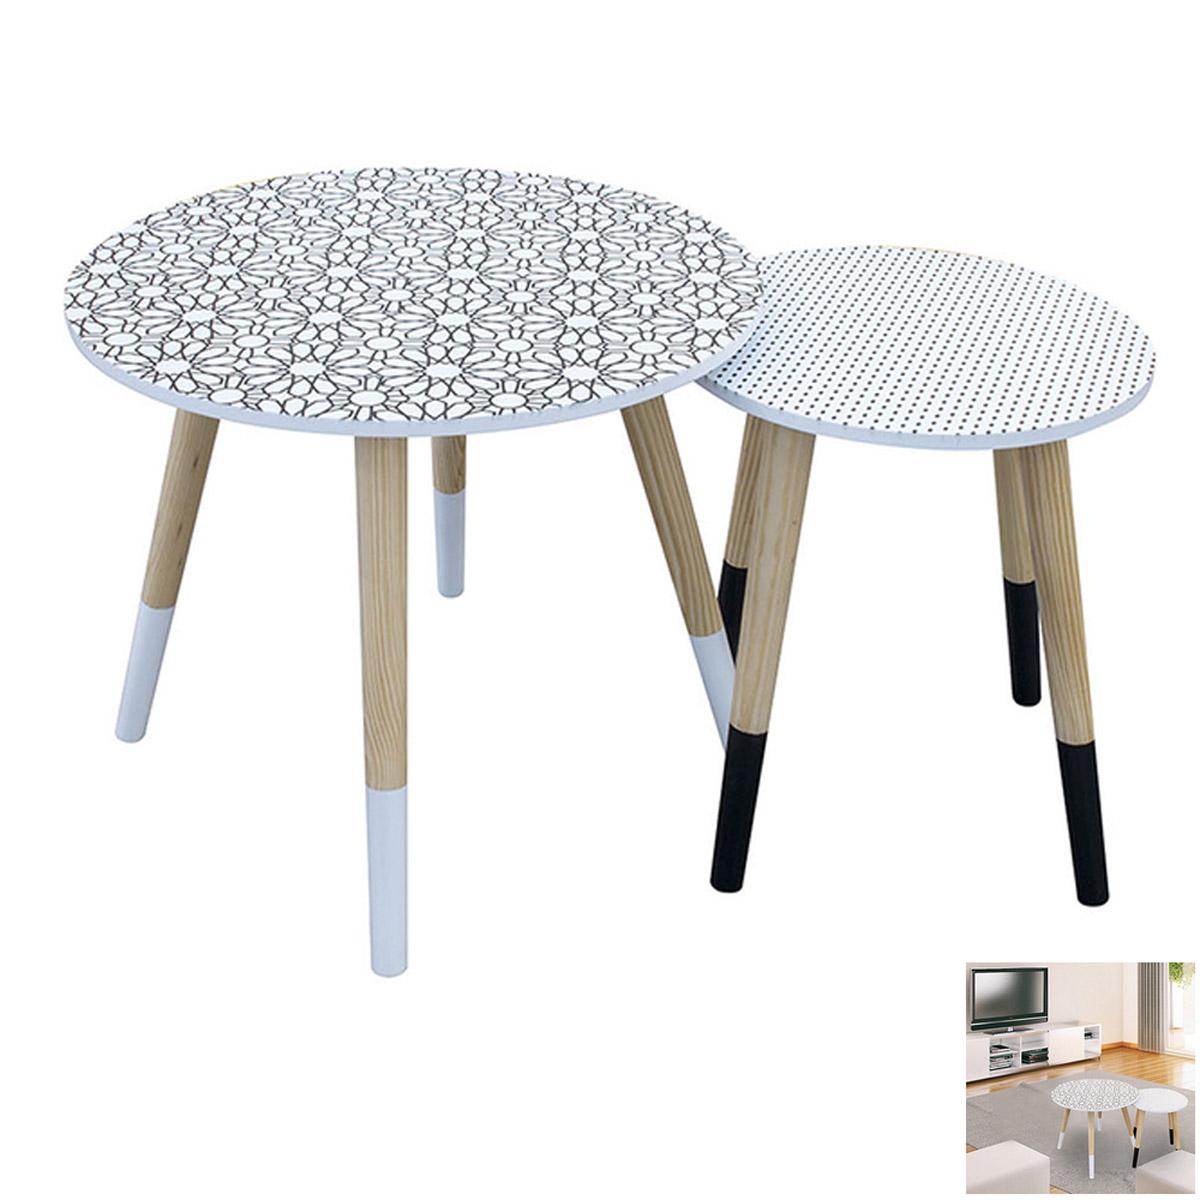 2 tables gigognes bois \'Boho\' blanc noir  - 48 et 33 cm - [R2397]